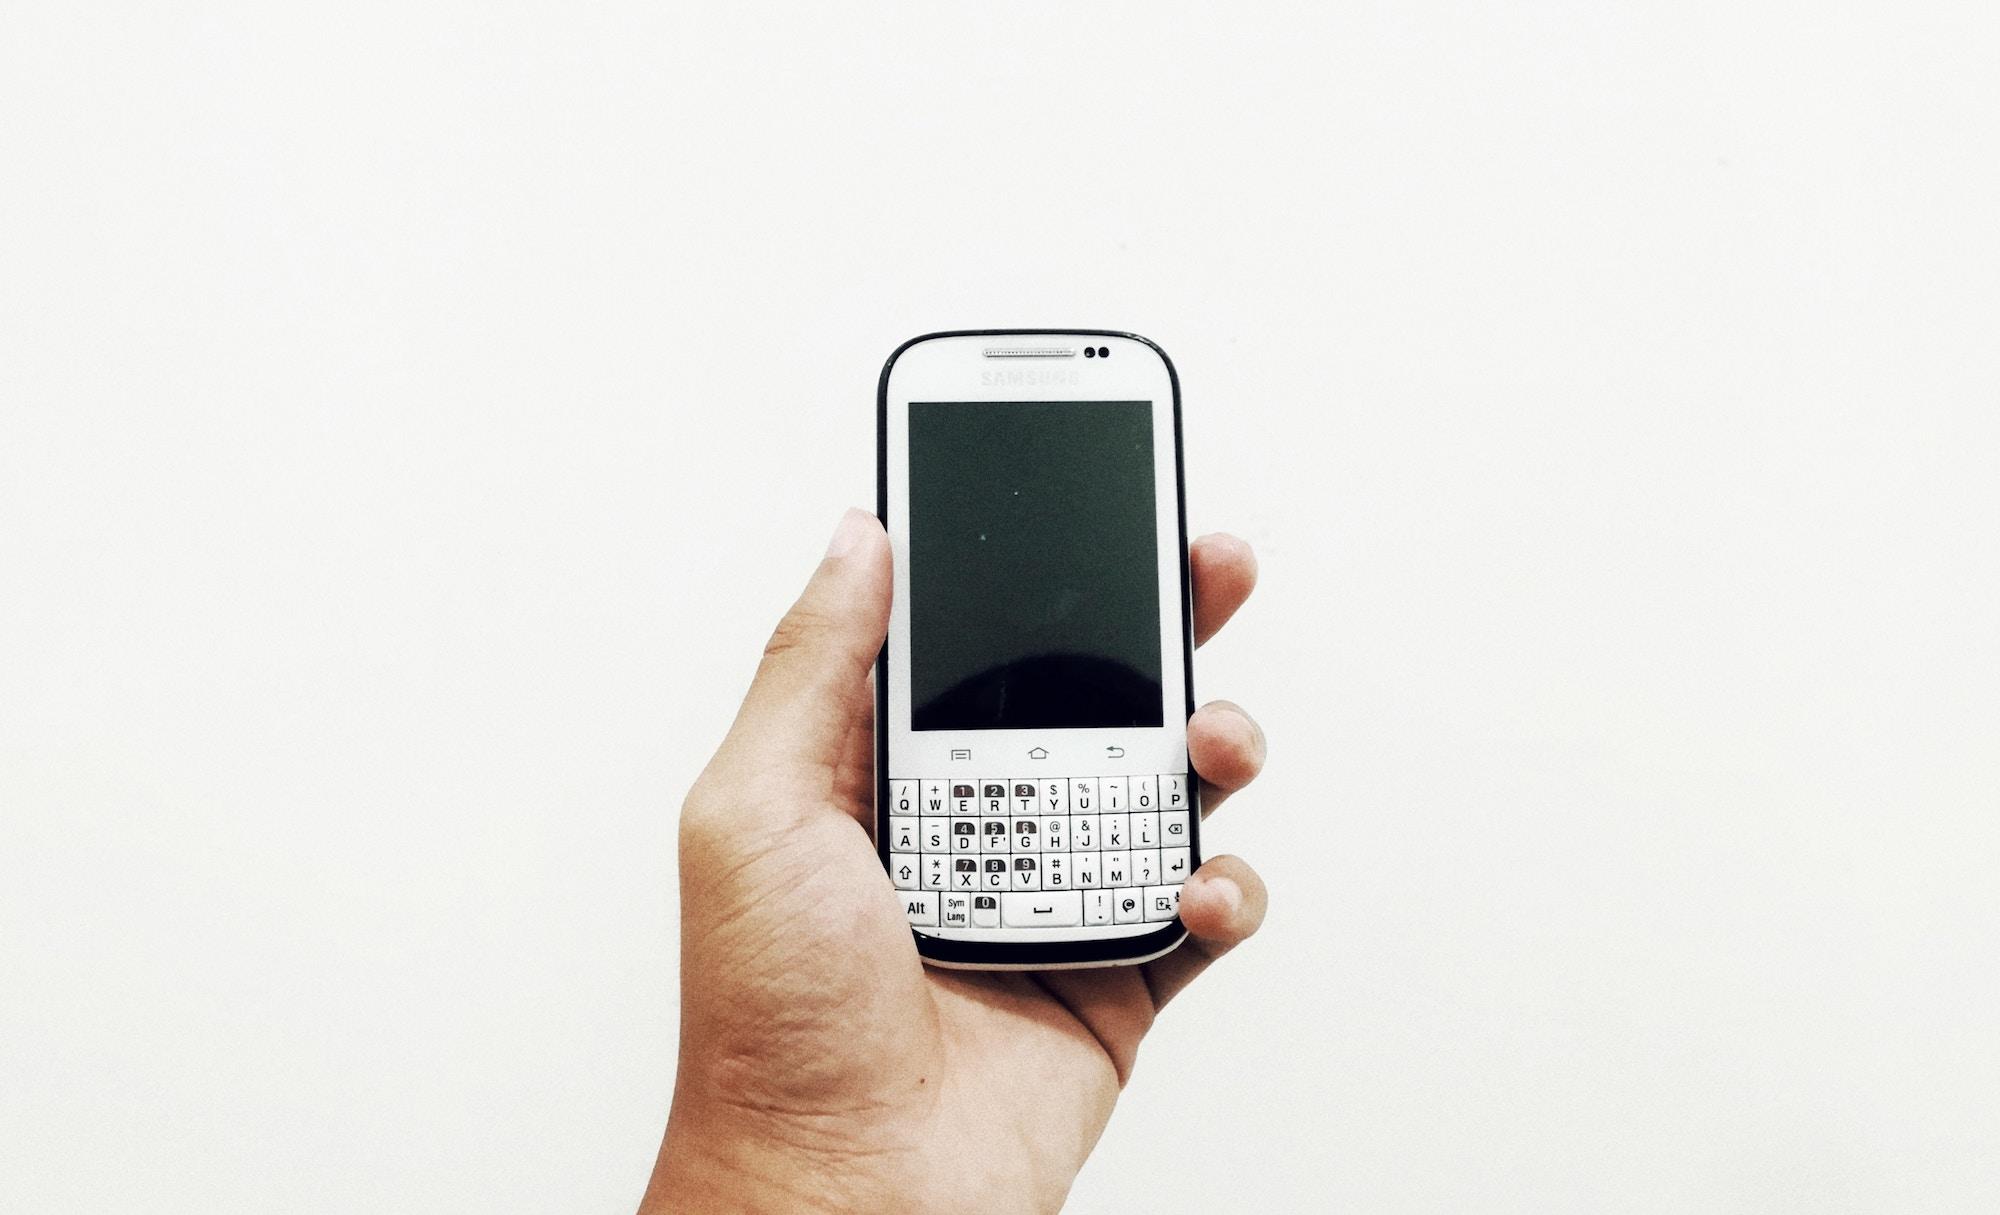 Knopkovi mobiľni telefony znovu vhodjať v modu — doslidžennja